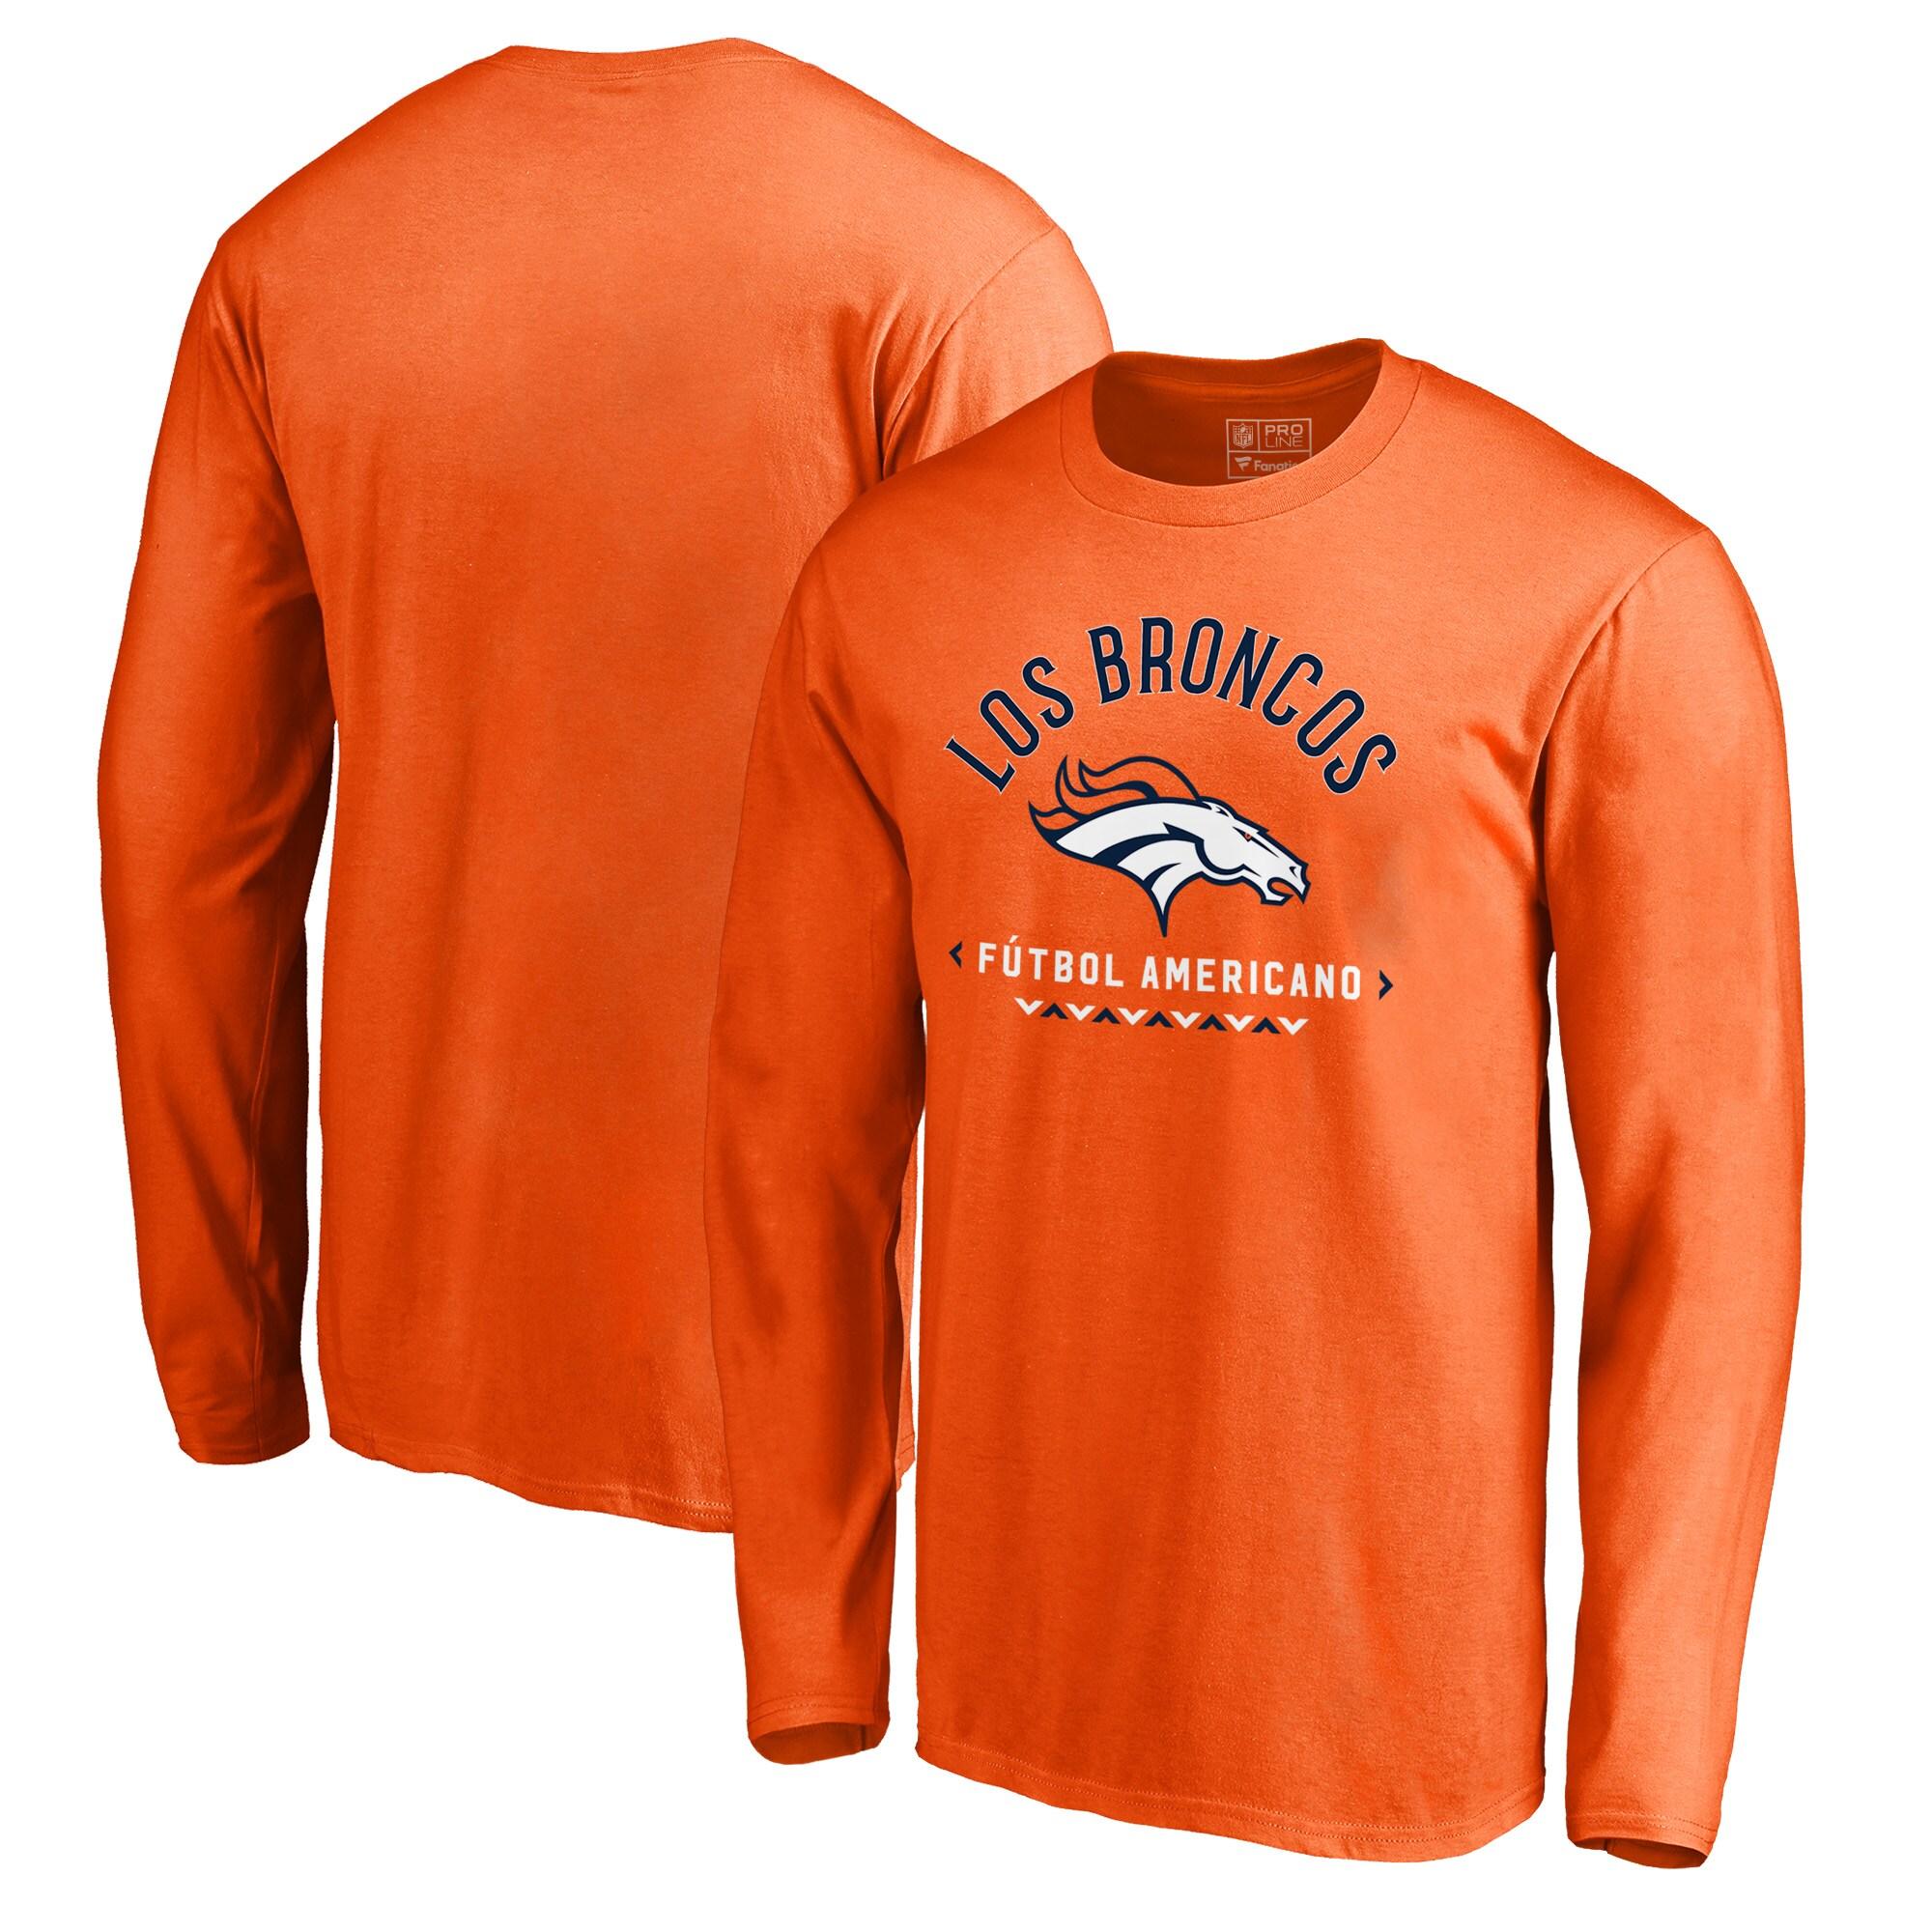 Denver Broncos NFL Pro Line by Fanatics Branded Futbol Americano Long Sleeve T-Shirt - Orange